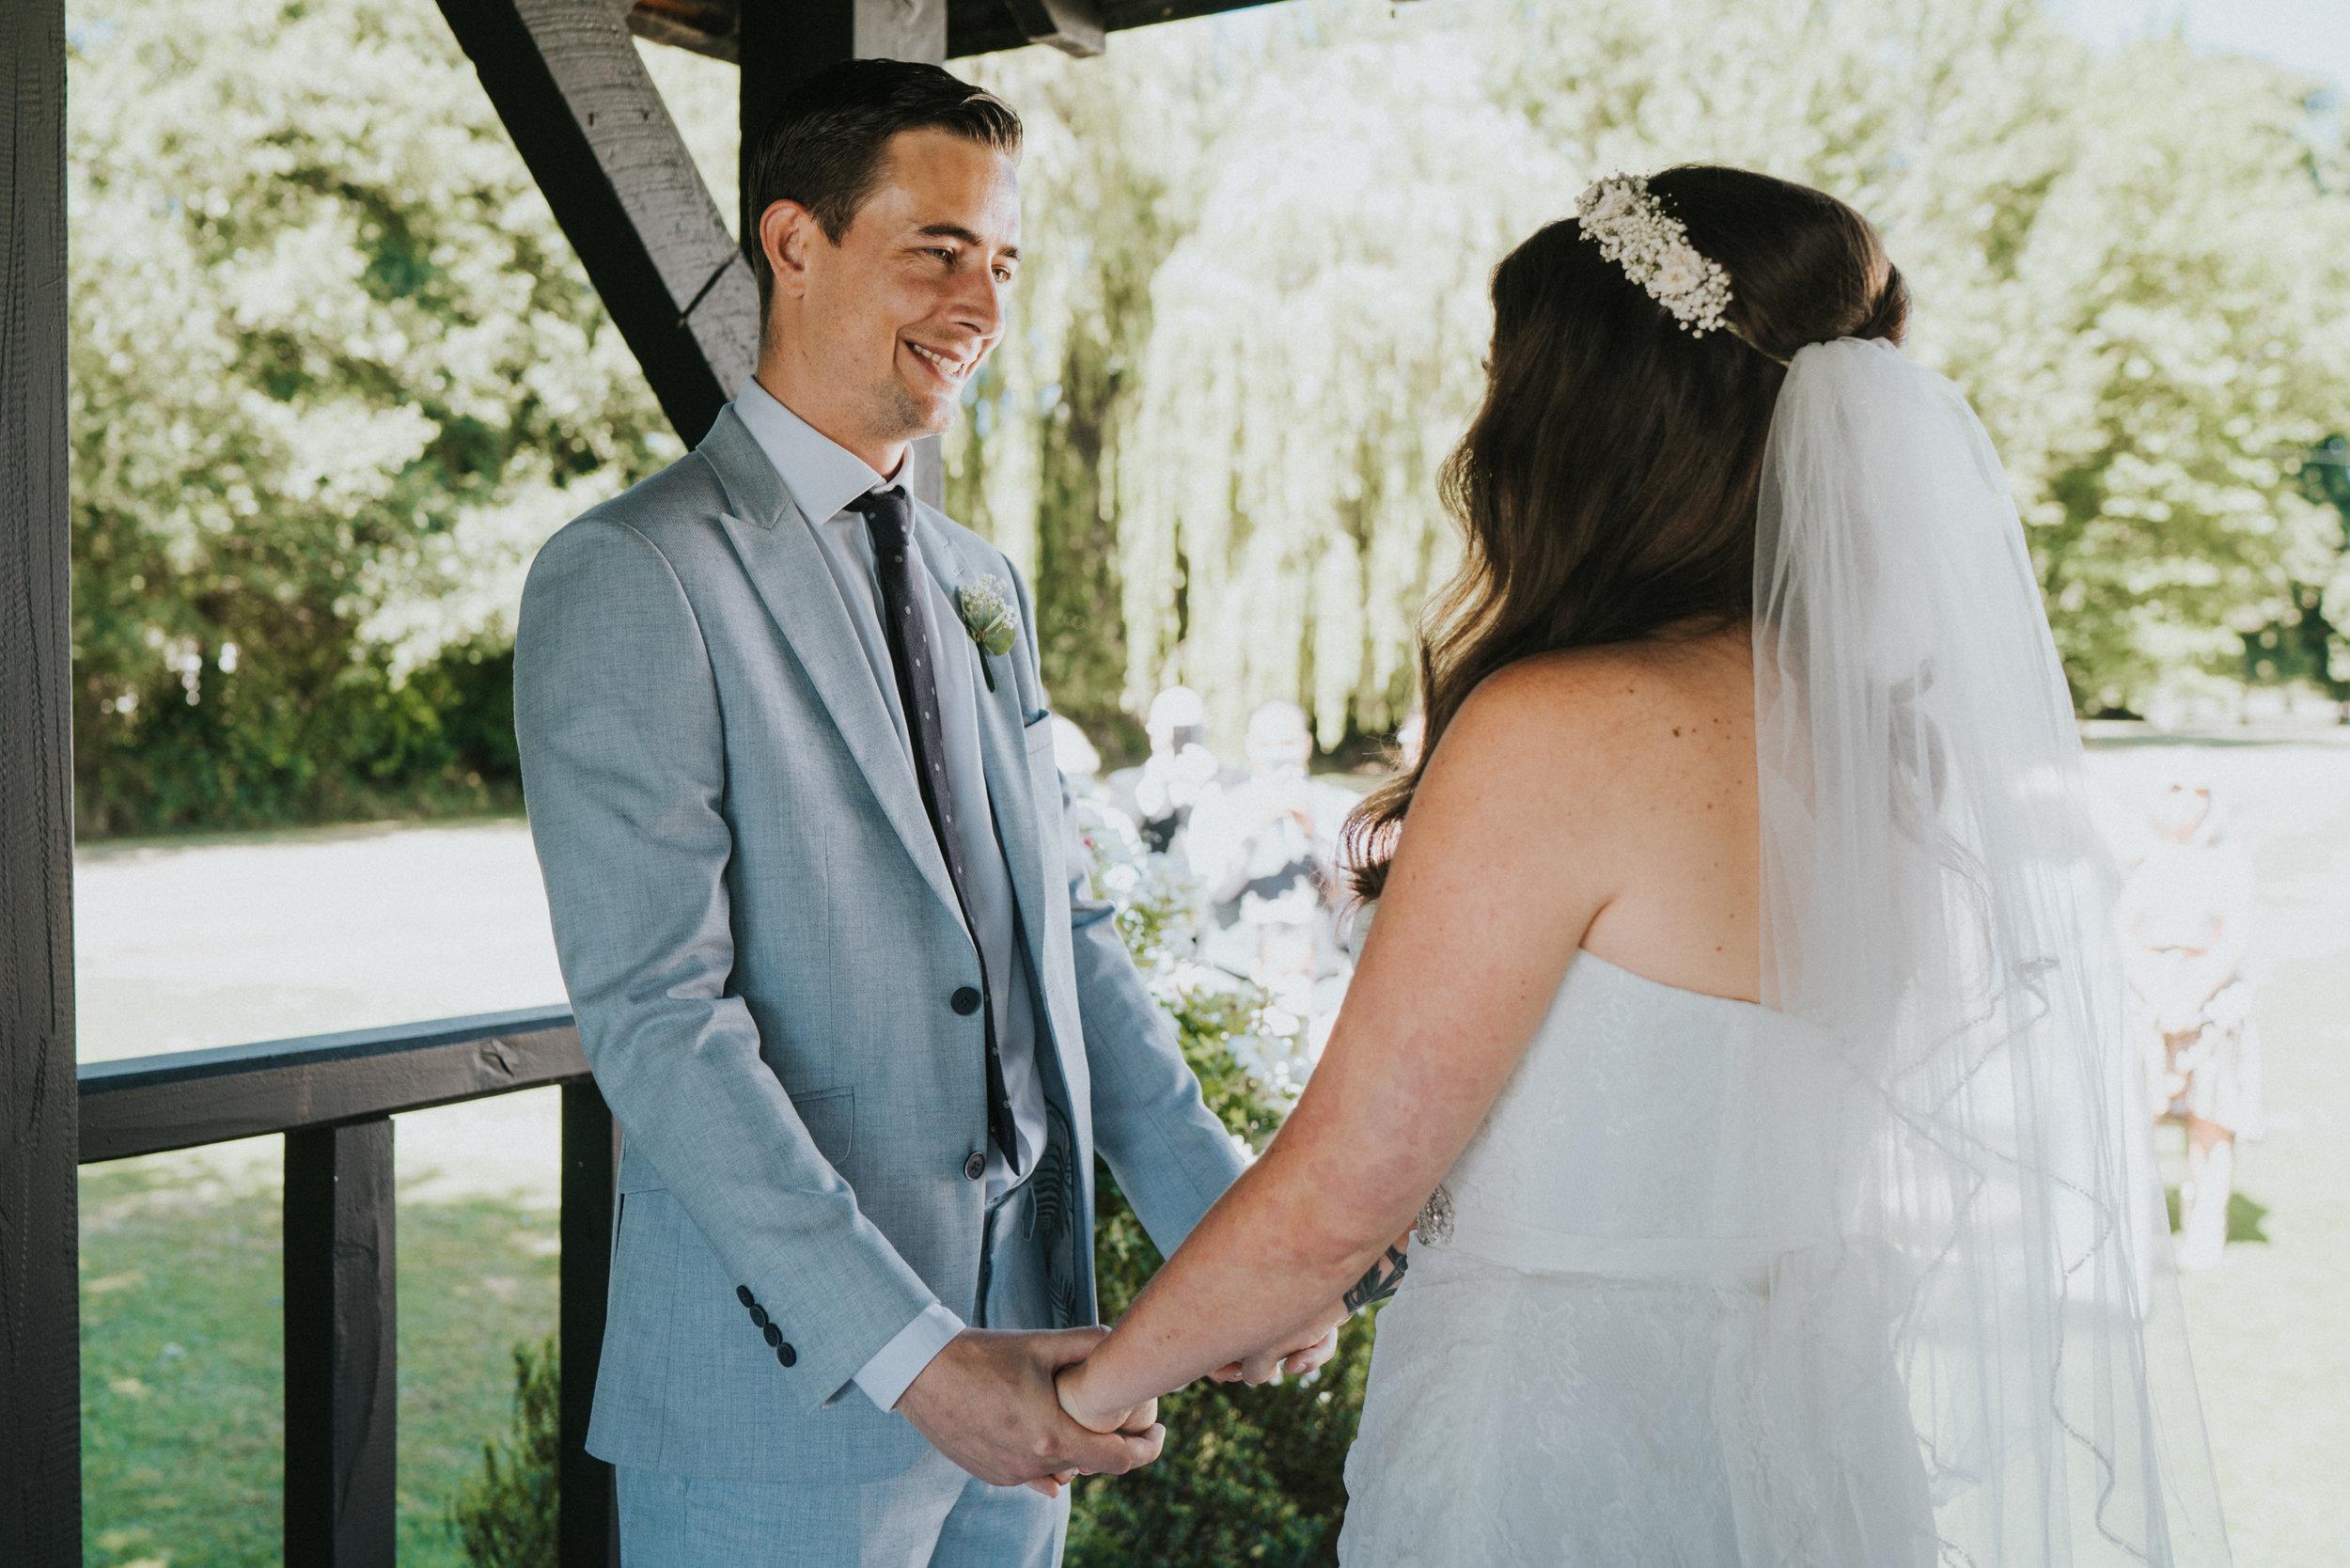 Sophie-Christian-Prested-Hall-Grace-Elizabeth-Previews-Essex-Norfolk-Suffolk-Devon-Alternative-Wedding-Photographer (7 of 20).jpg